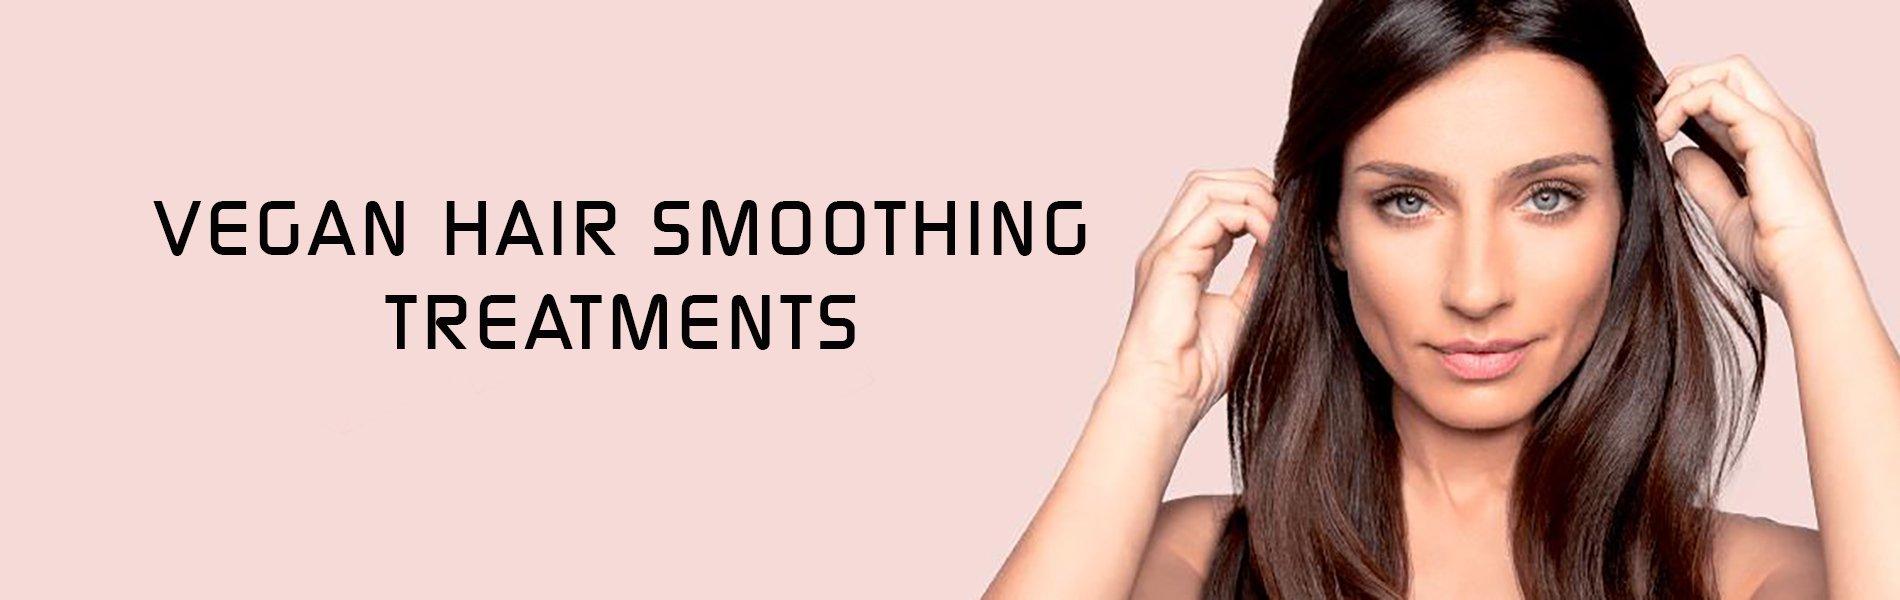 Vegan Hair Smoothing Treatments Uxbridge Hairdressers